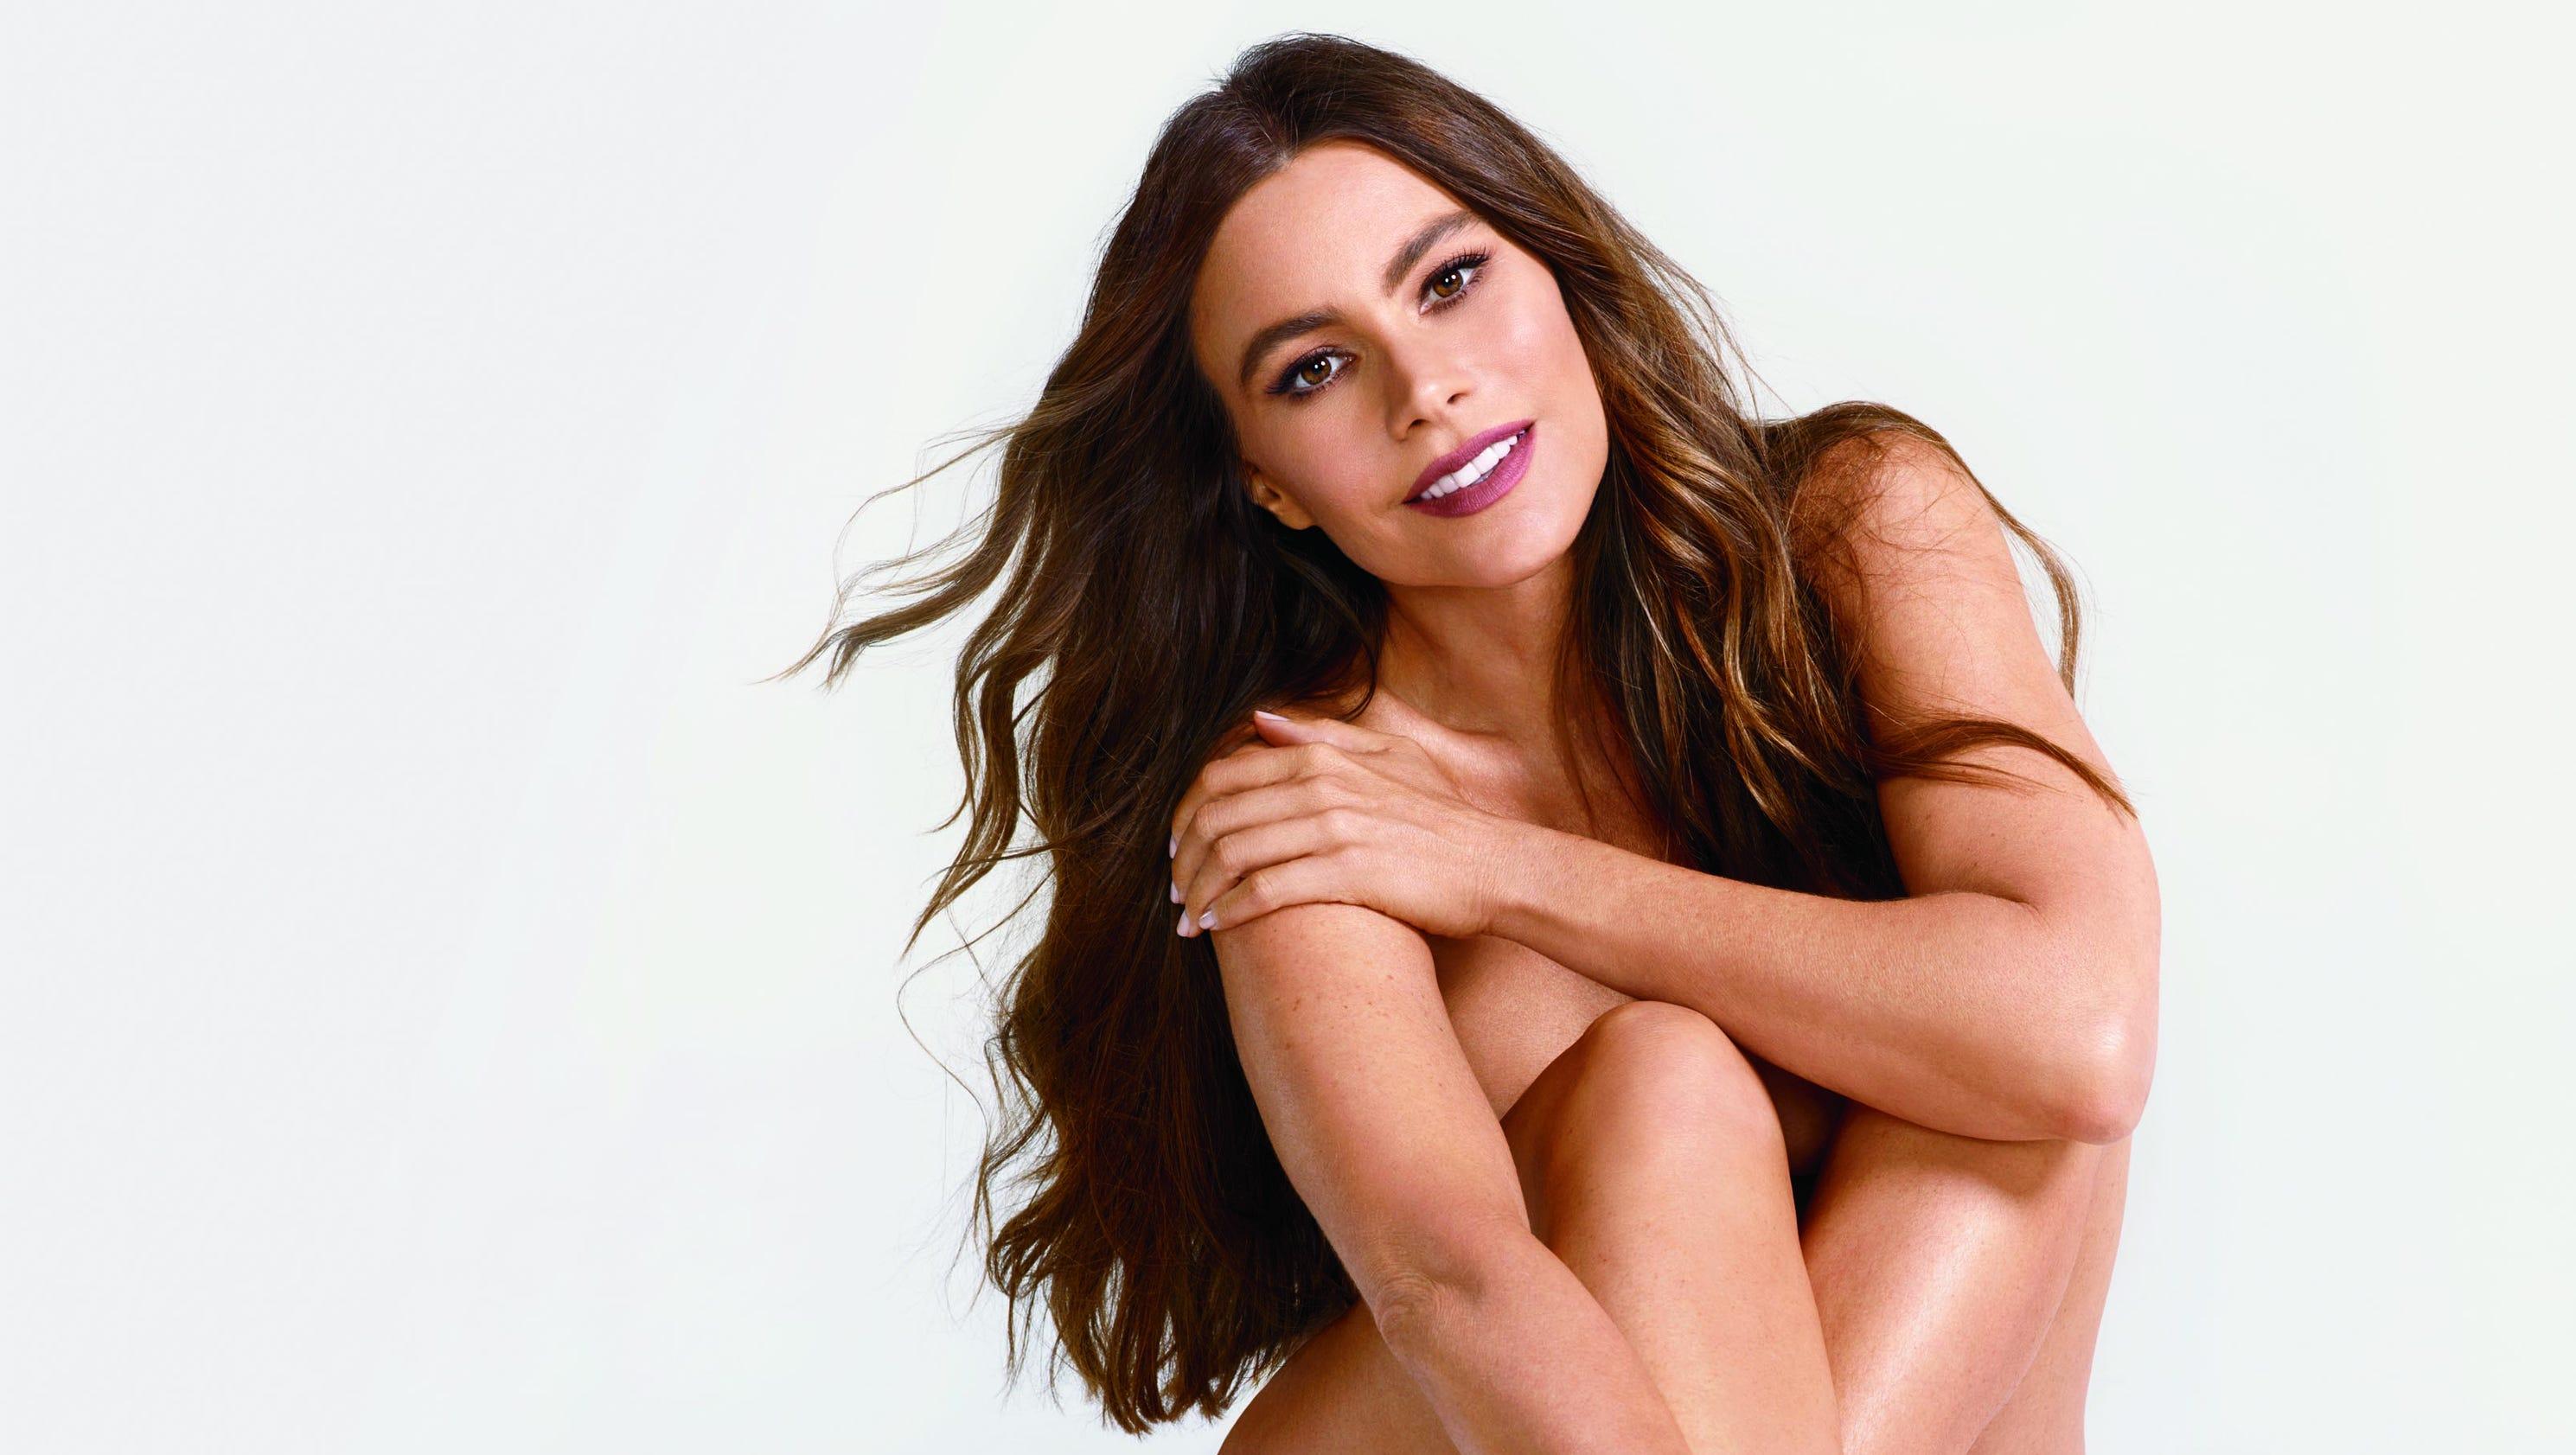 Ladys vierzig plus nackt, naked sexy ladies pissing